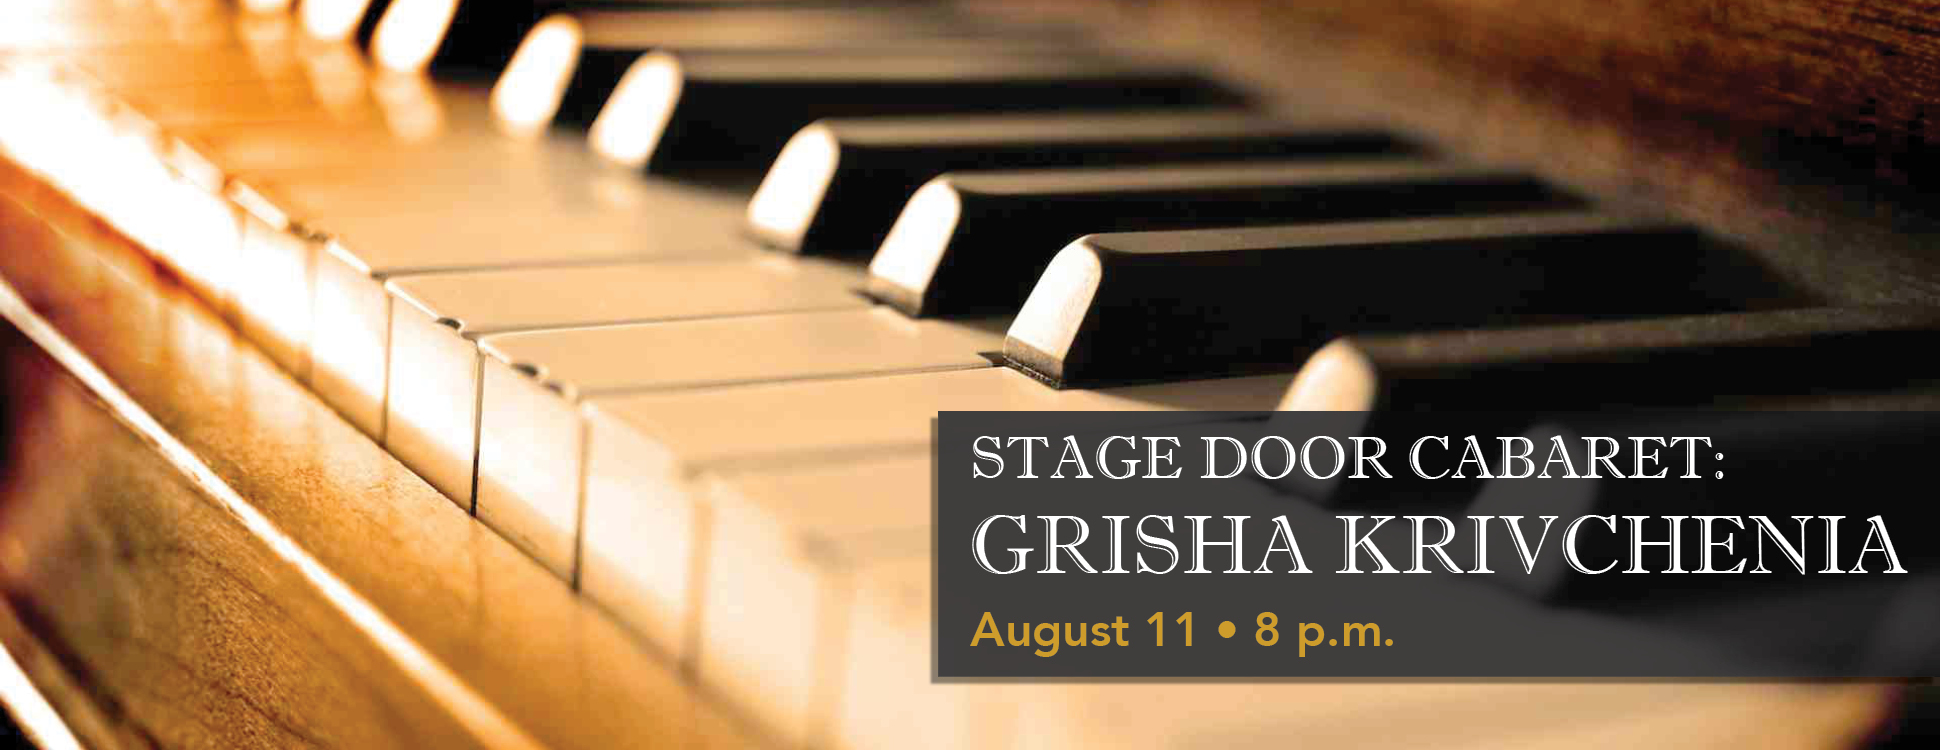 Stage Door Cabaret: Grisha Krivchenia